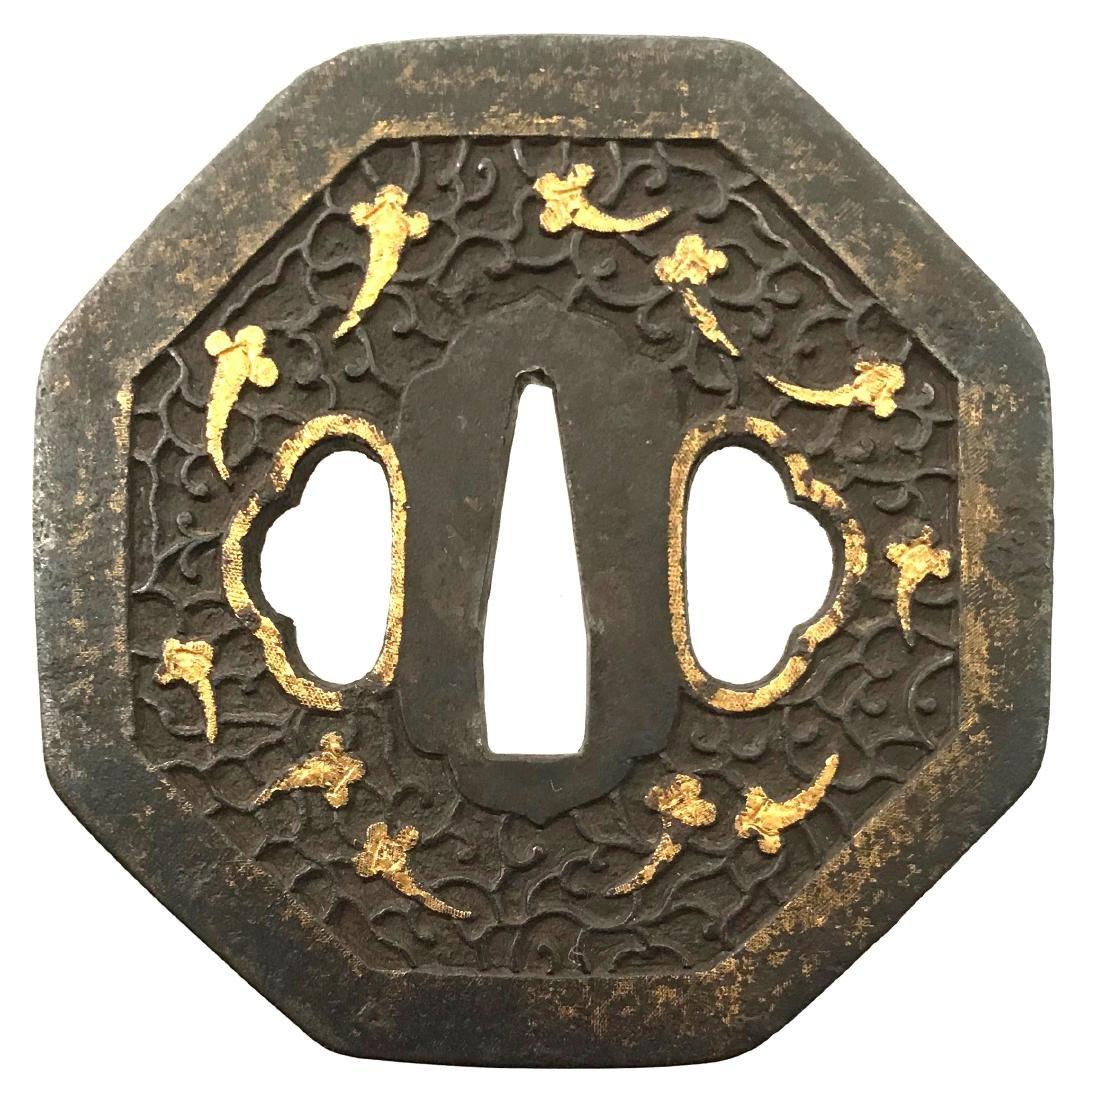 Iron tsuba with myriad treasures motif